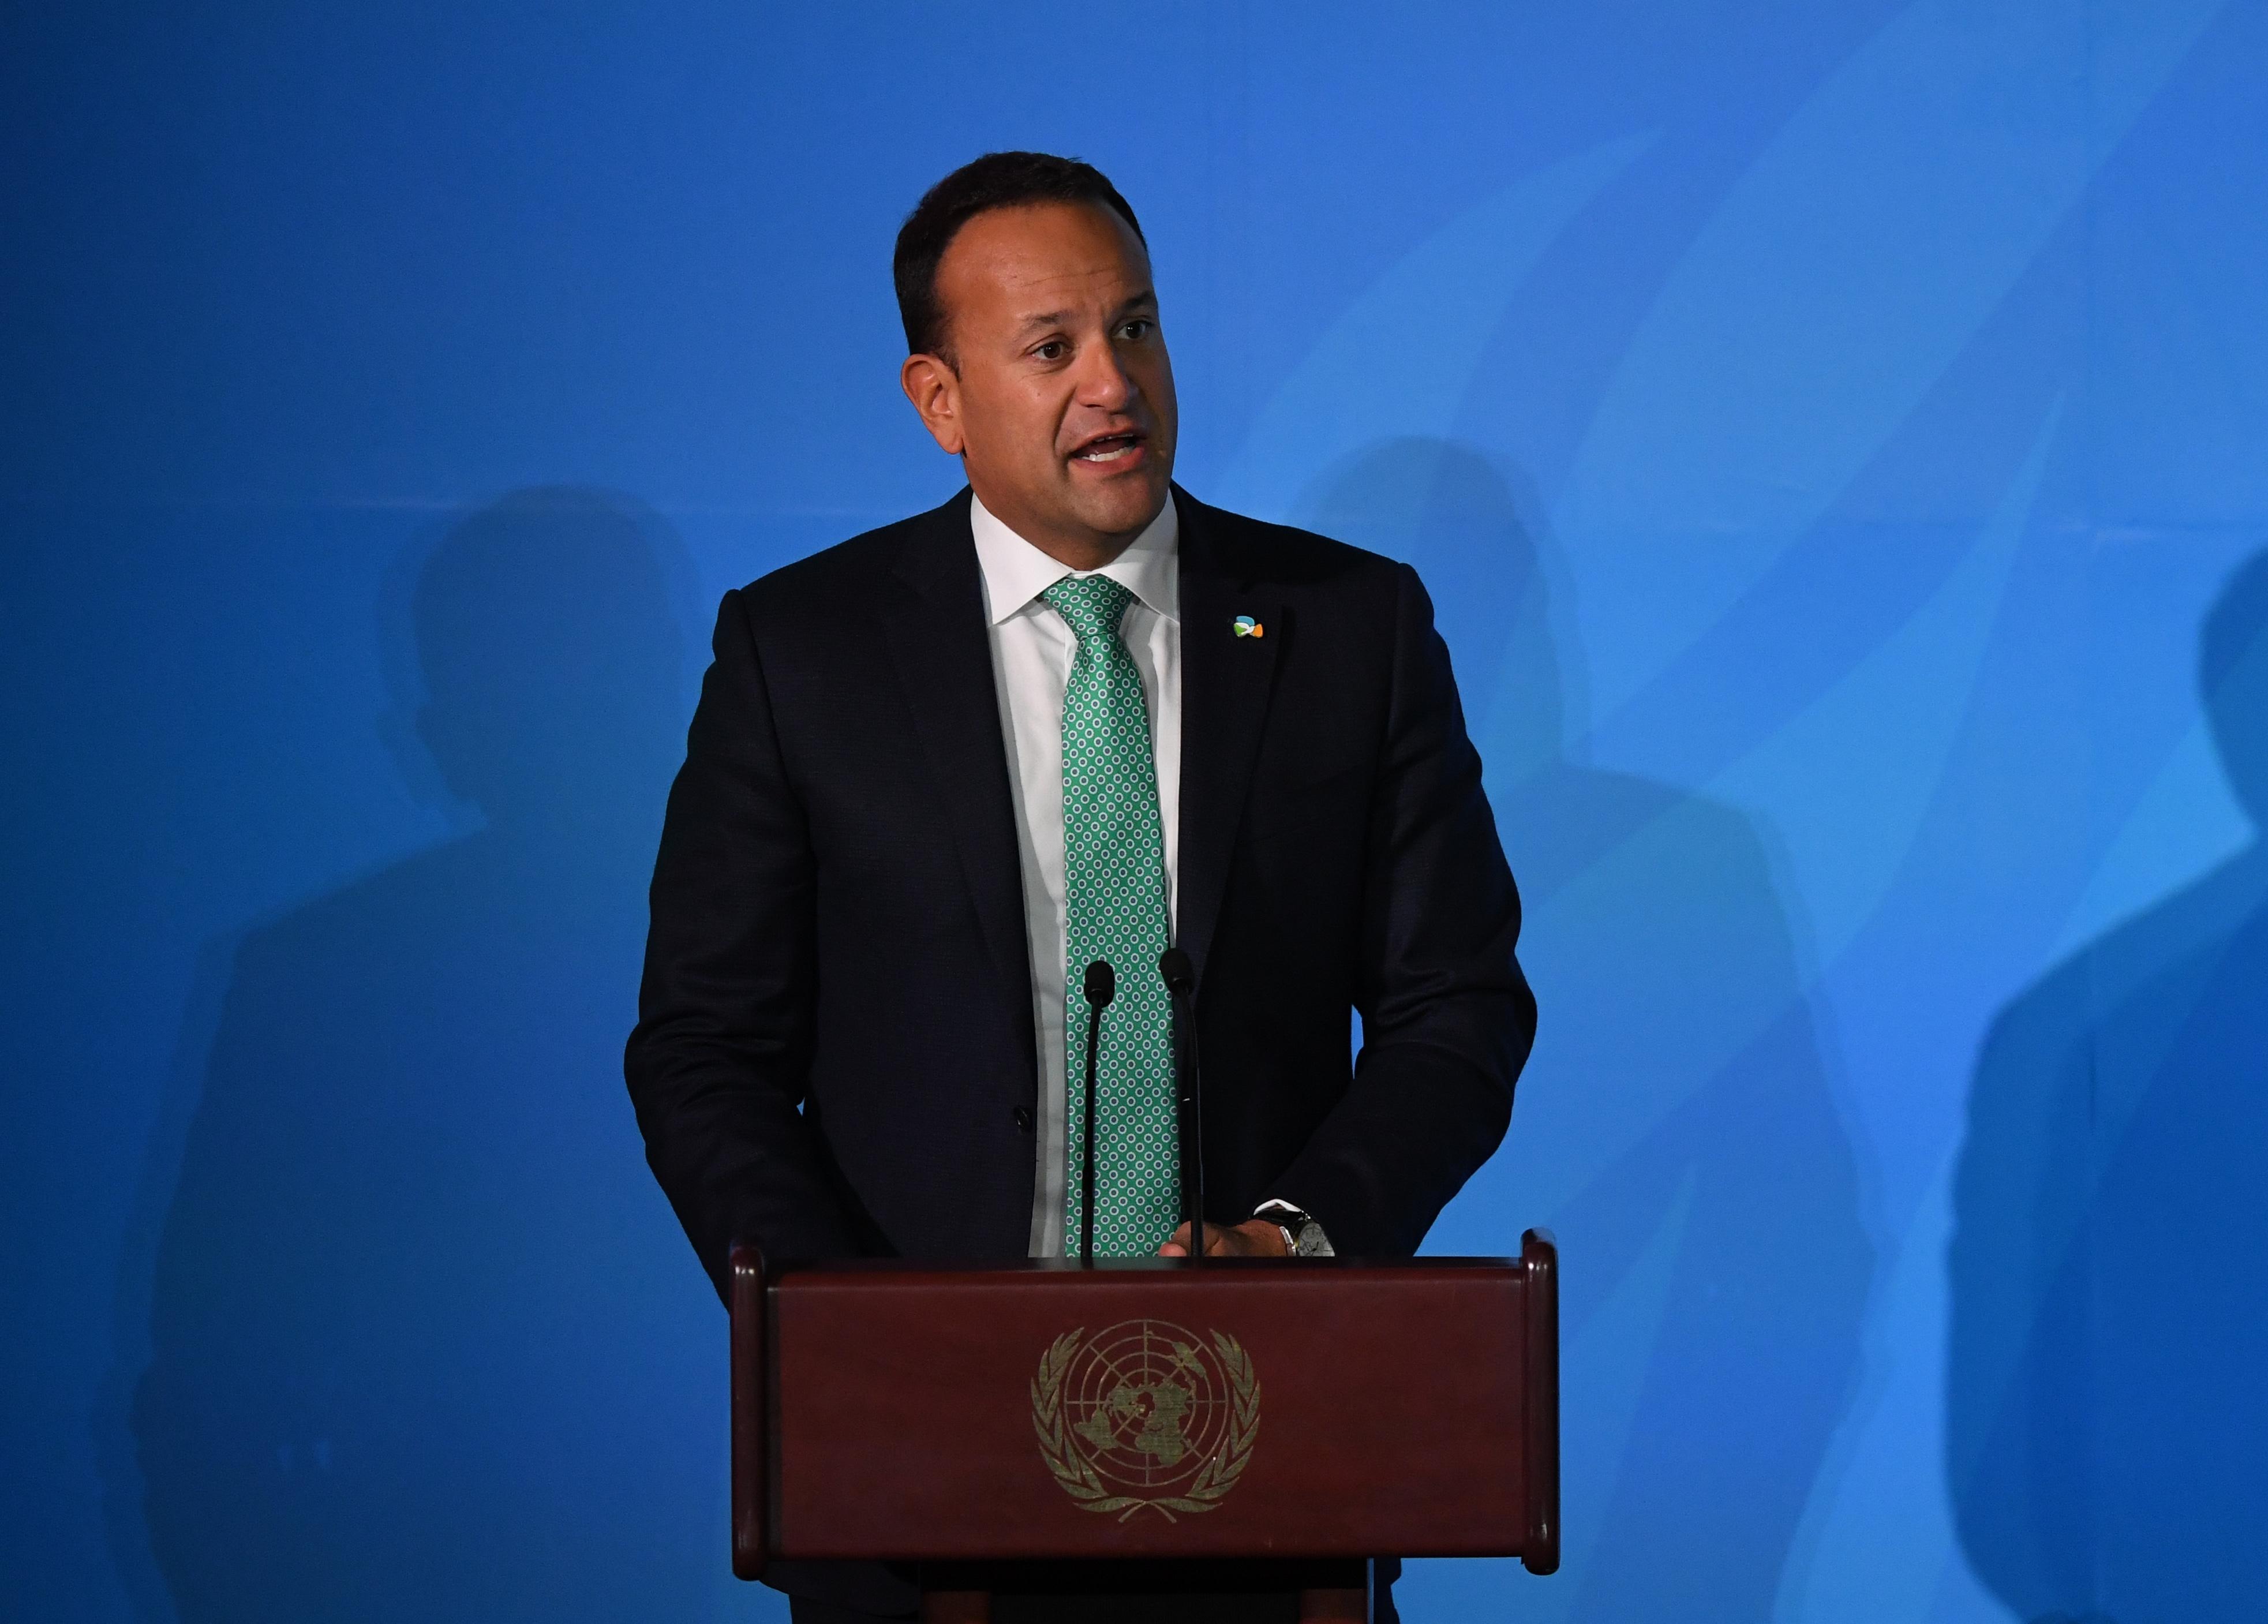 Irish Prime Minister Leo Varadkar isn't too impressed with the new proposal.